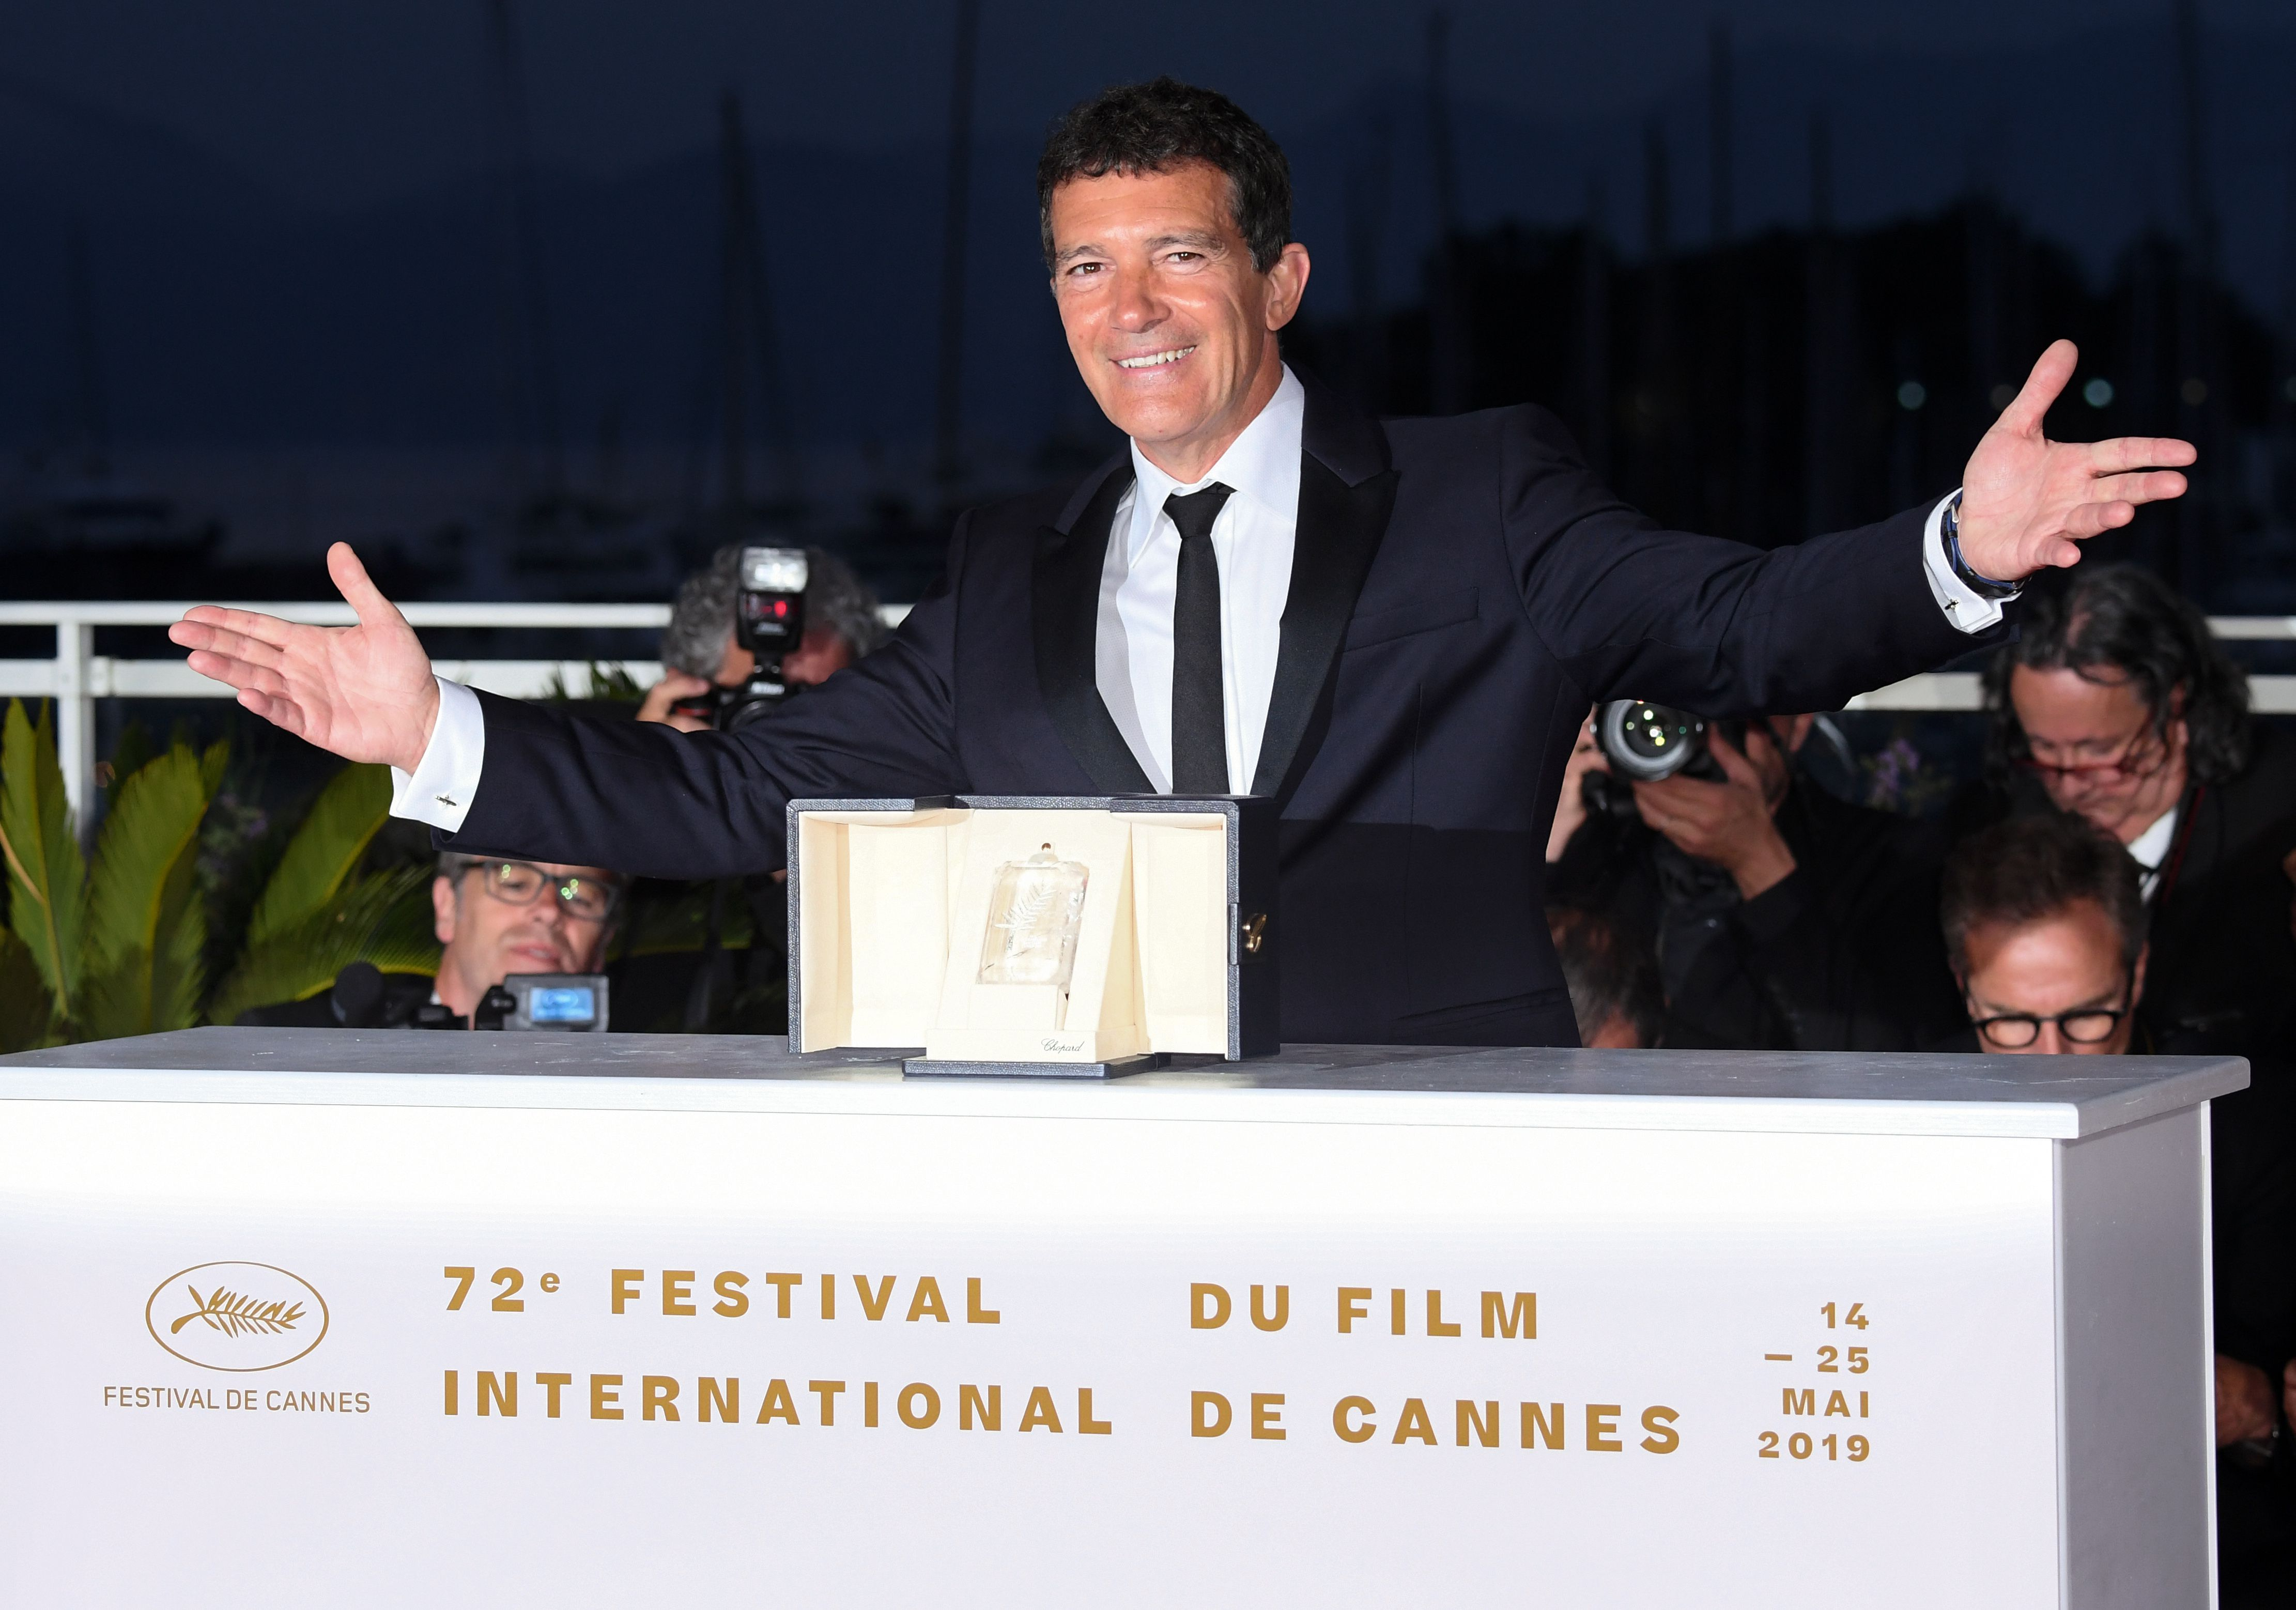 Who Won Best Actor 2020 Cannes Best Actor Win Boosts Antonio Banderas Into Oscar Race